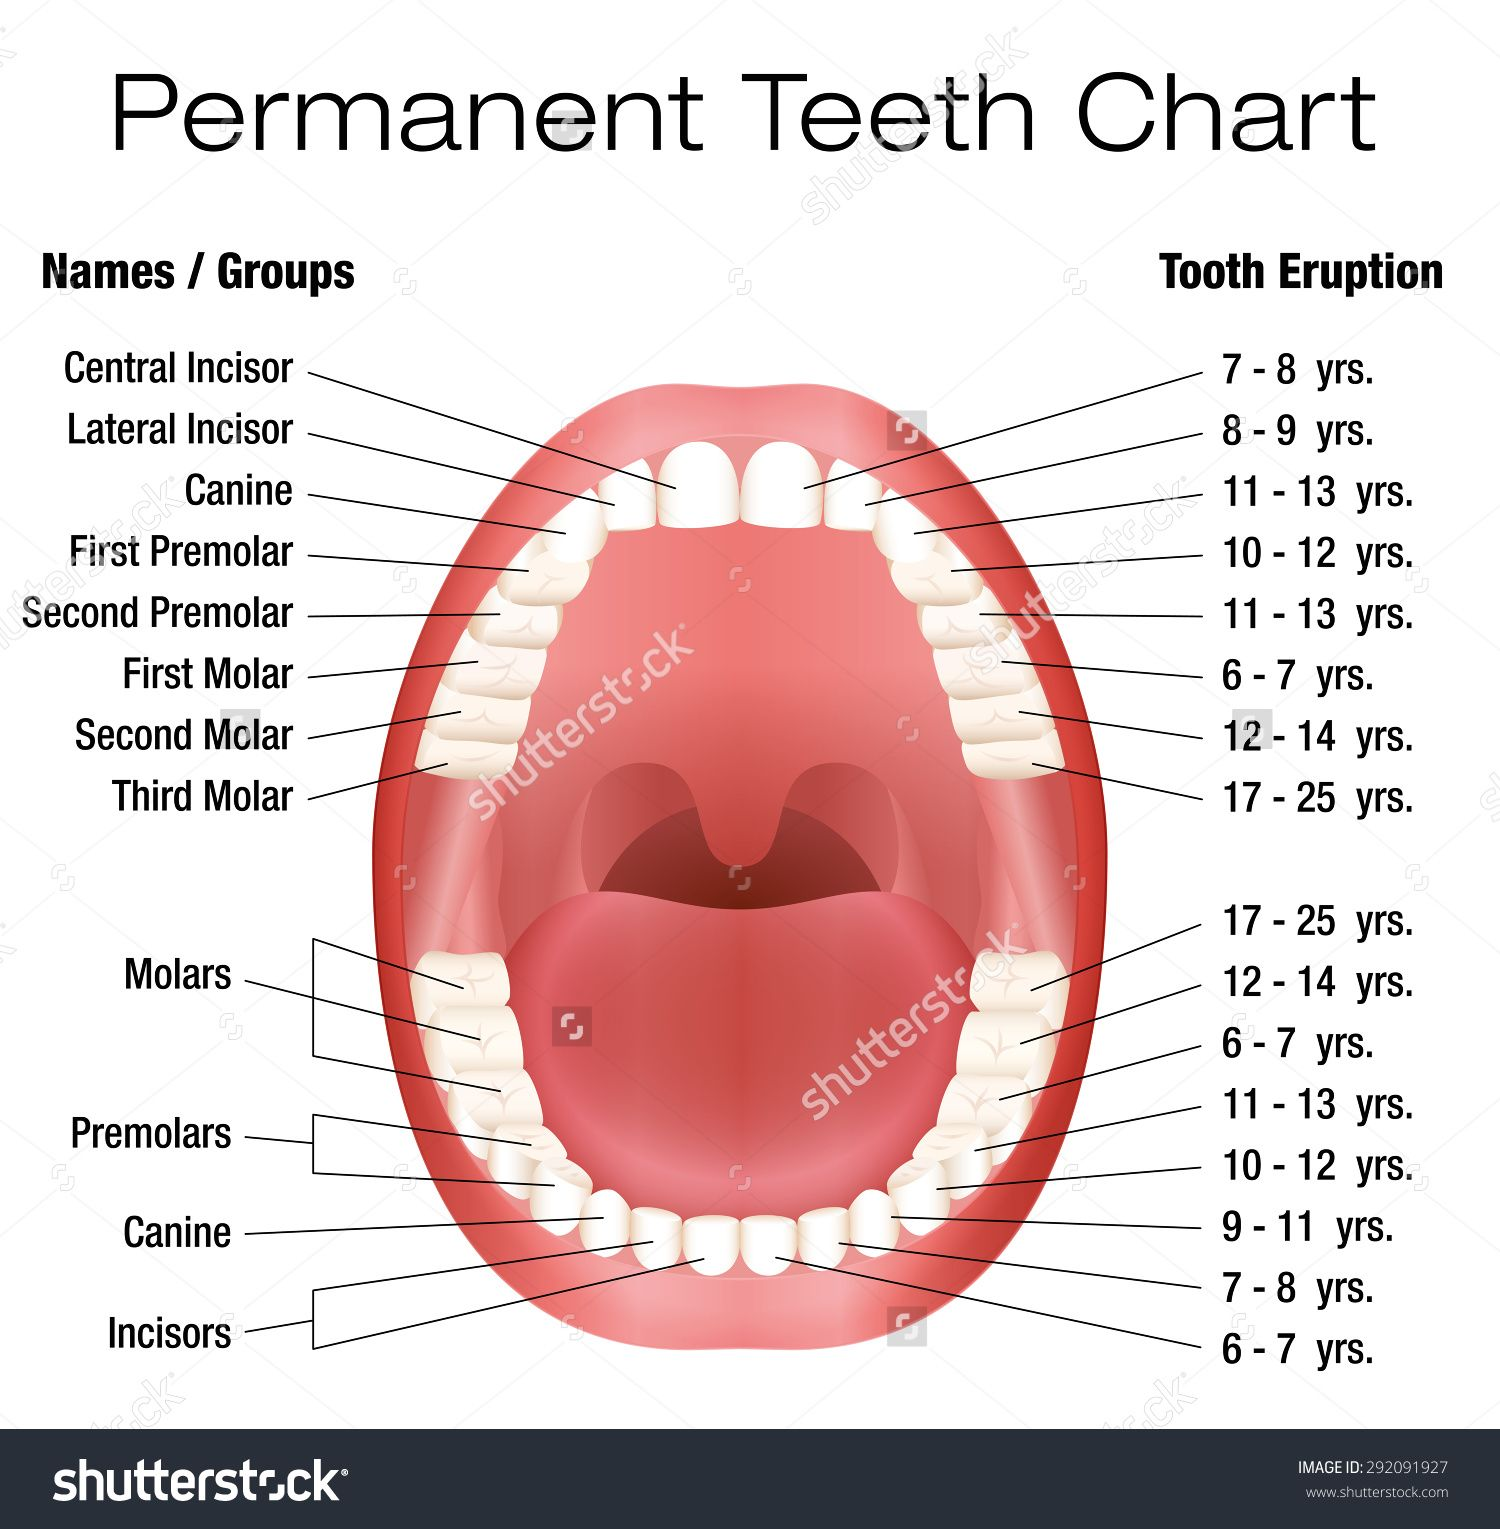 medium resolution of teeth eruption chart teeth images human teeth body organs tooth diagram